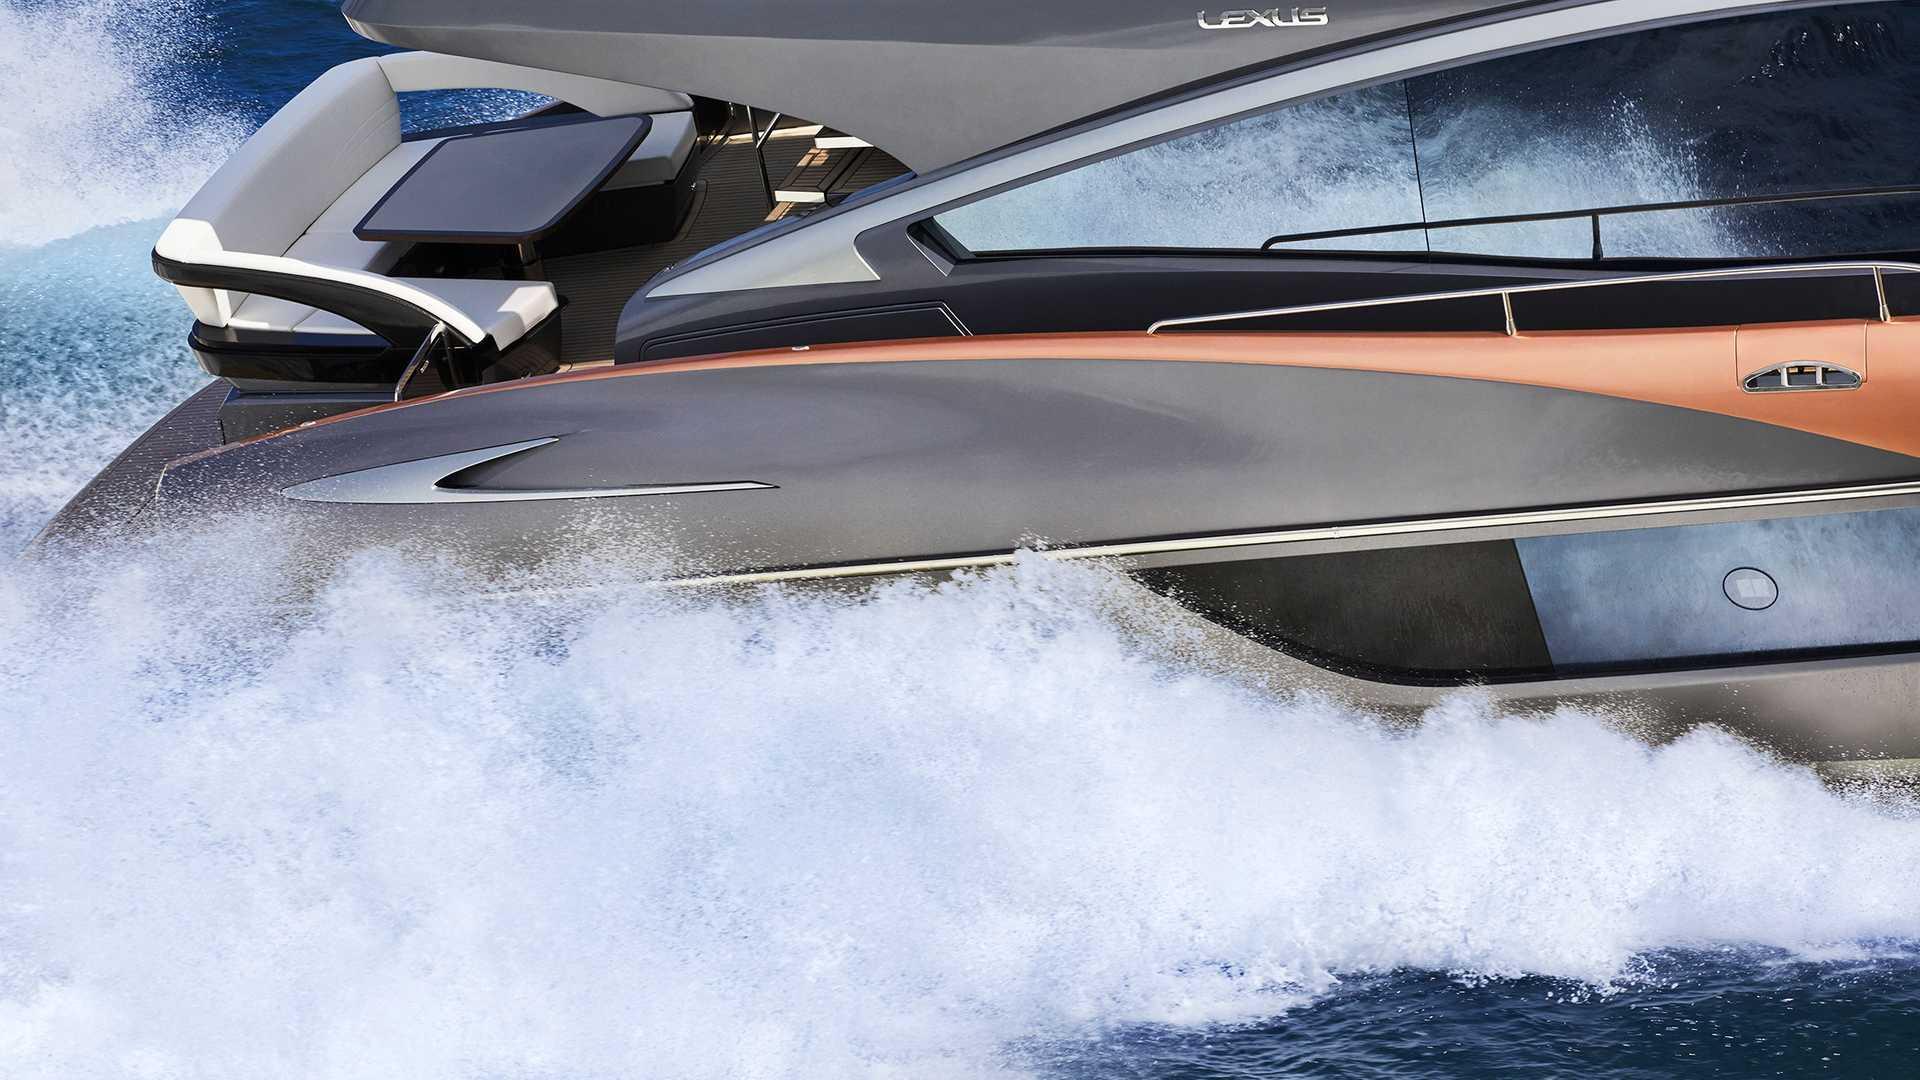 lexus-ly-650-yacht-2